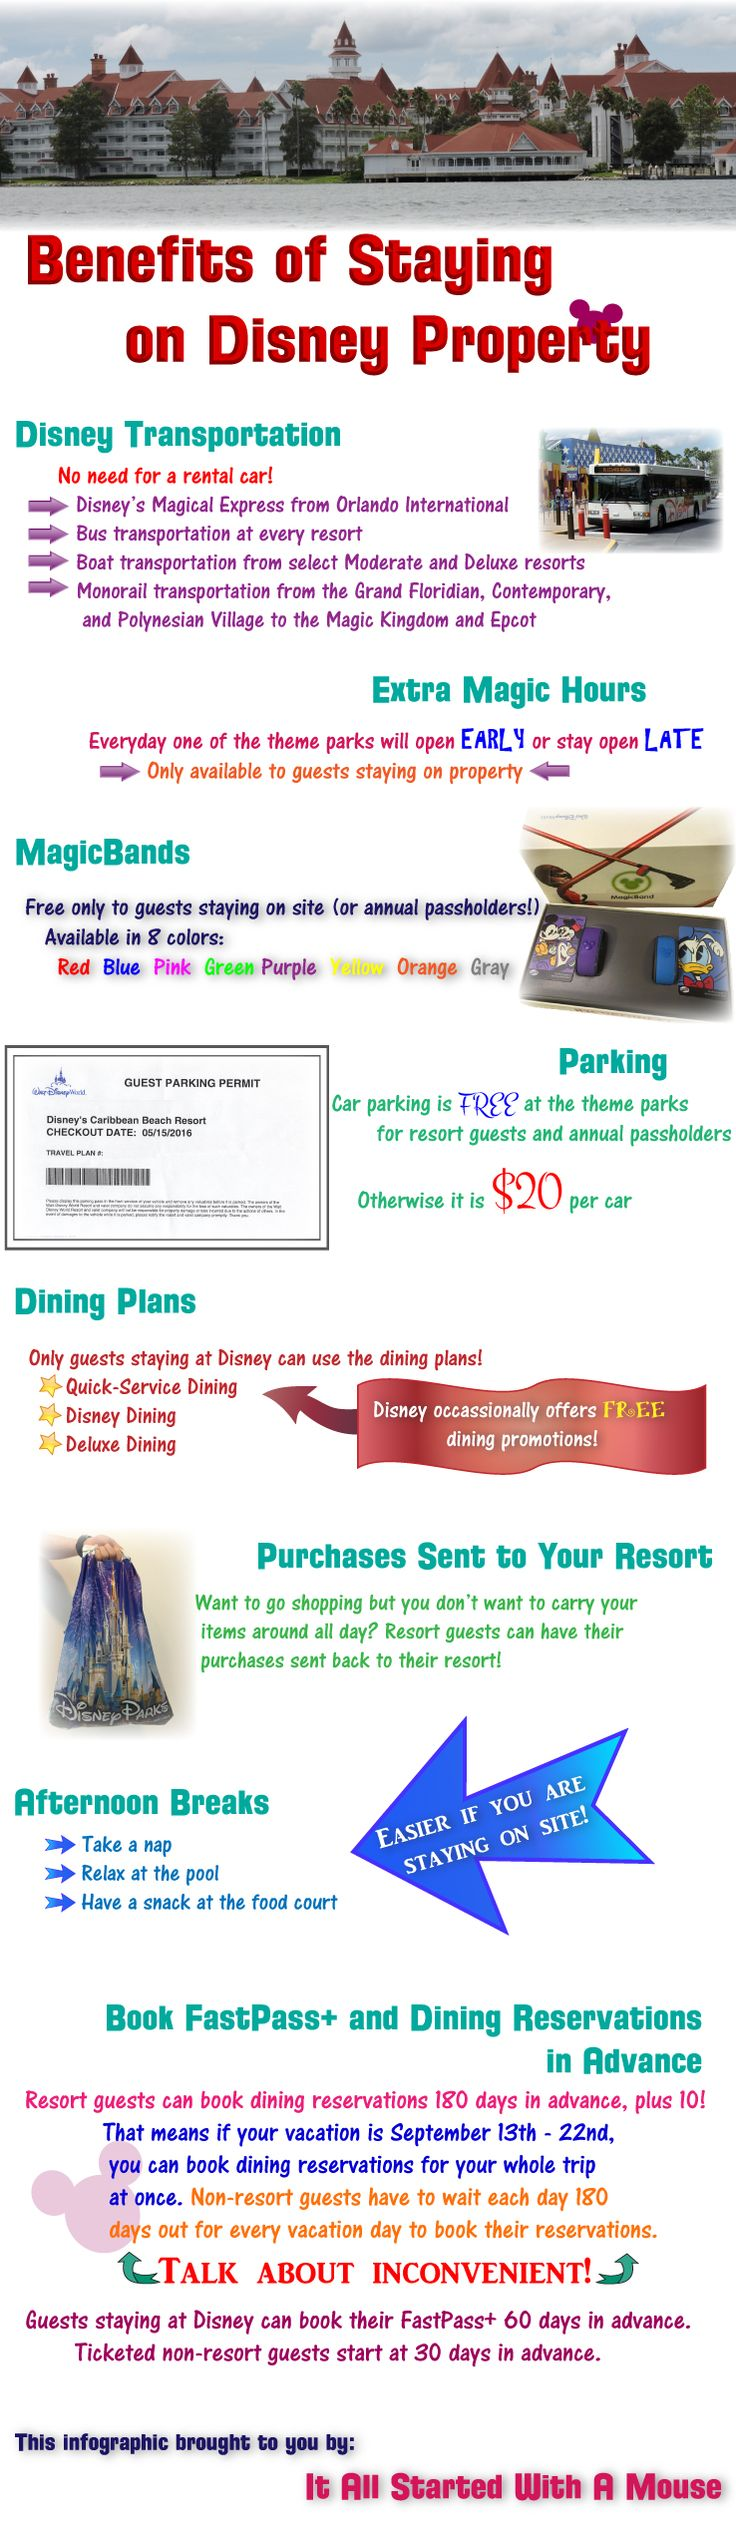 Benefits of Staying on Disney Property #itallstartedwithamouse